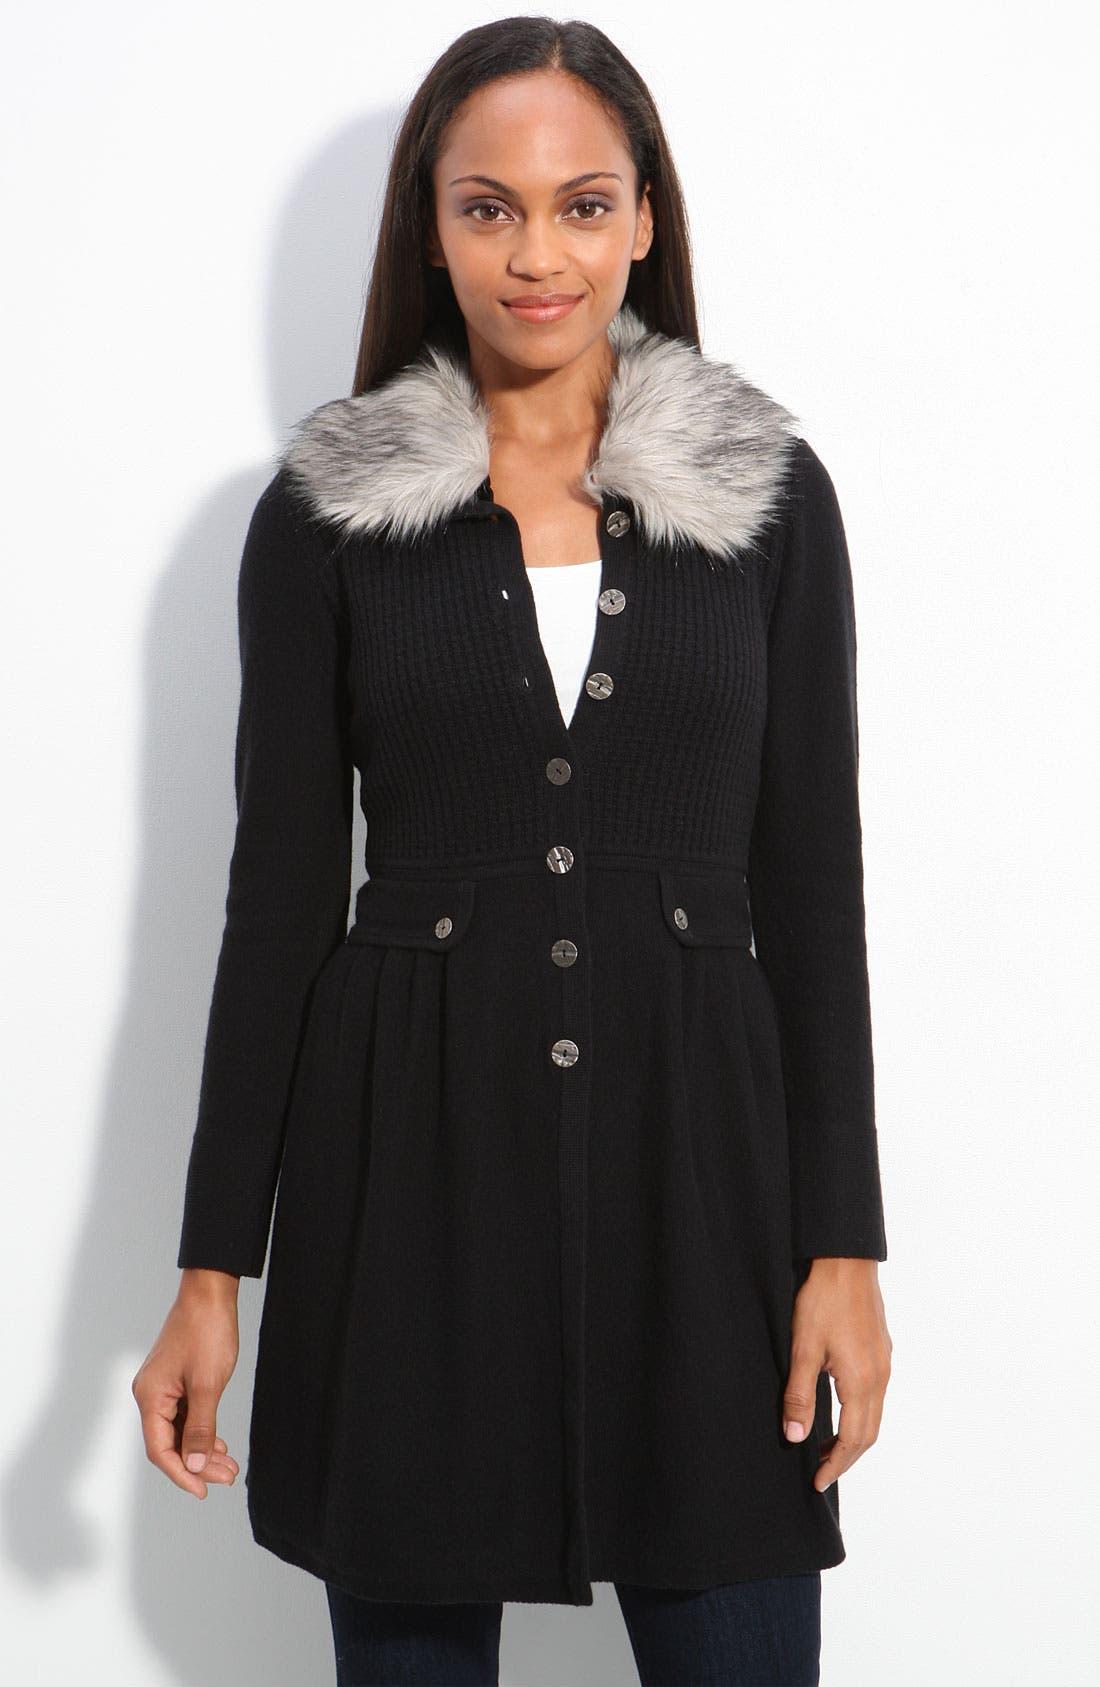 Main Image - Nic + Zoe Sweater Coat with Faux Fur Trim